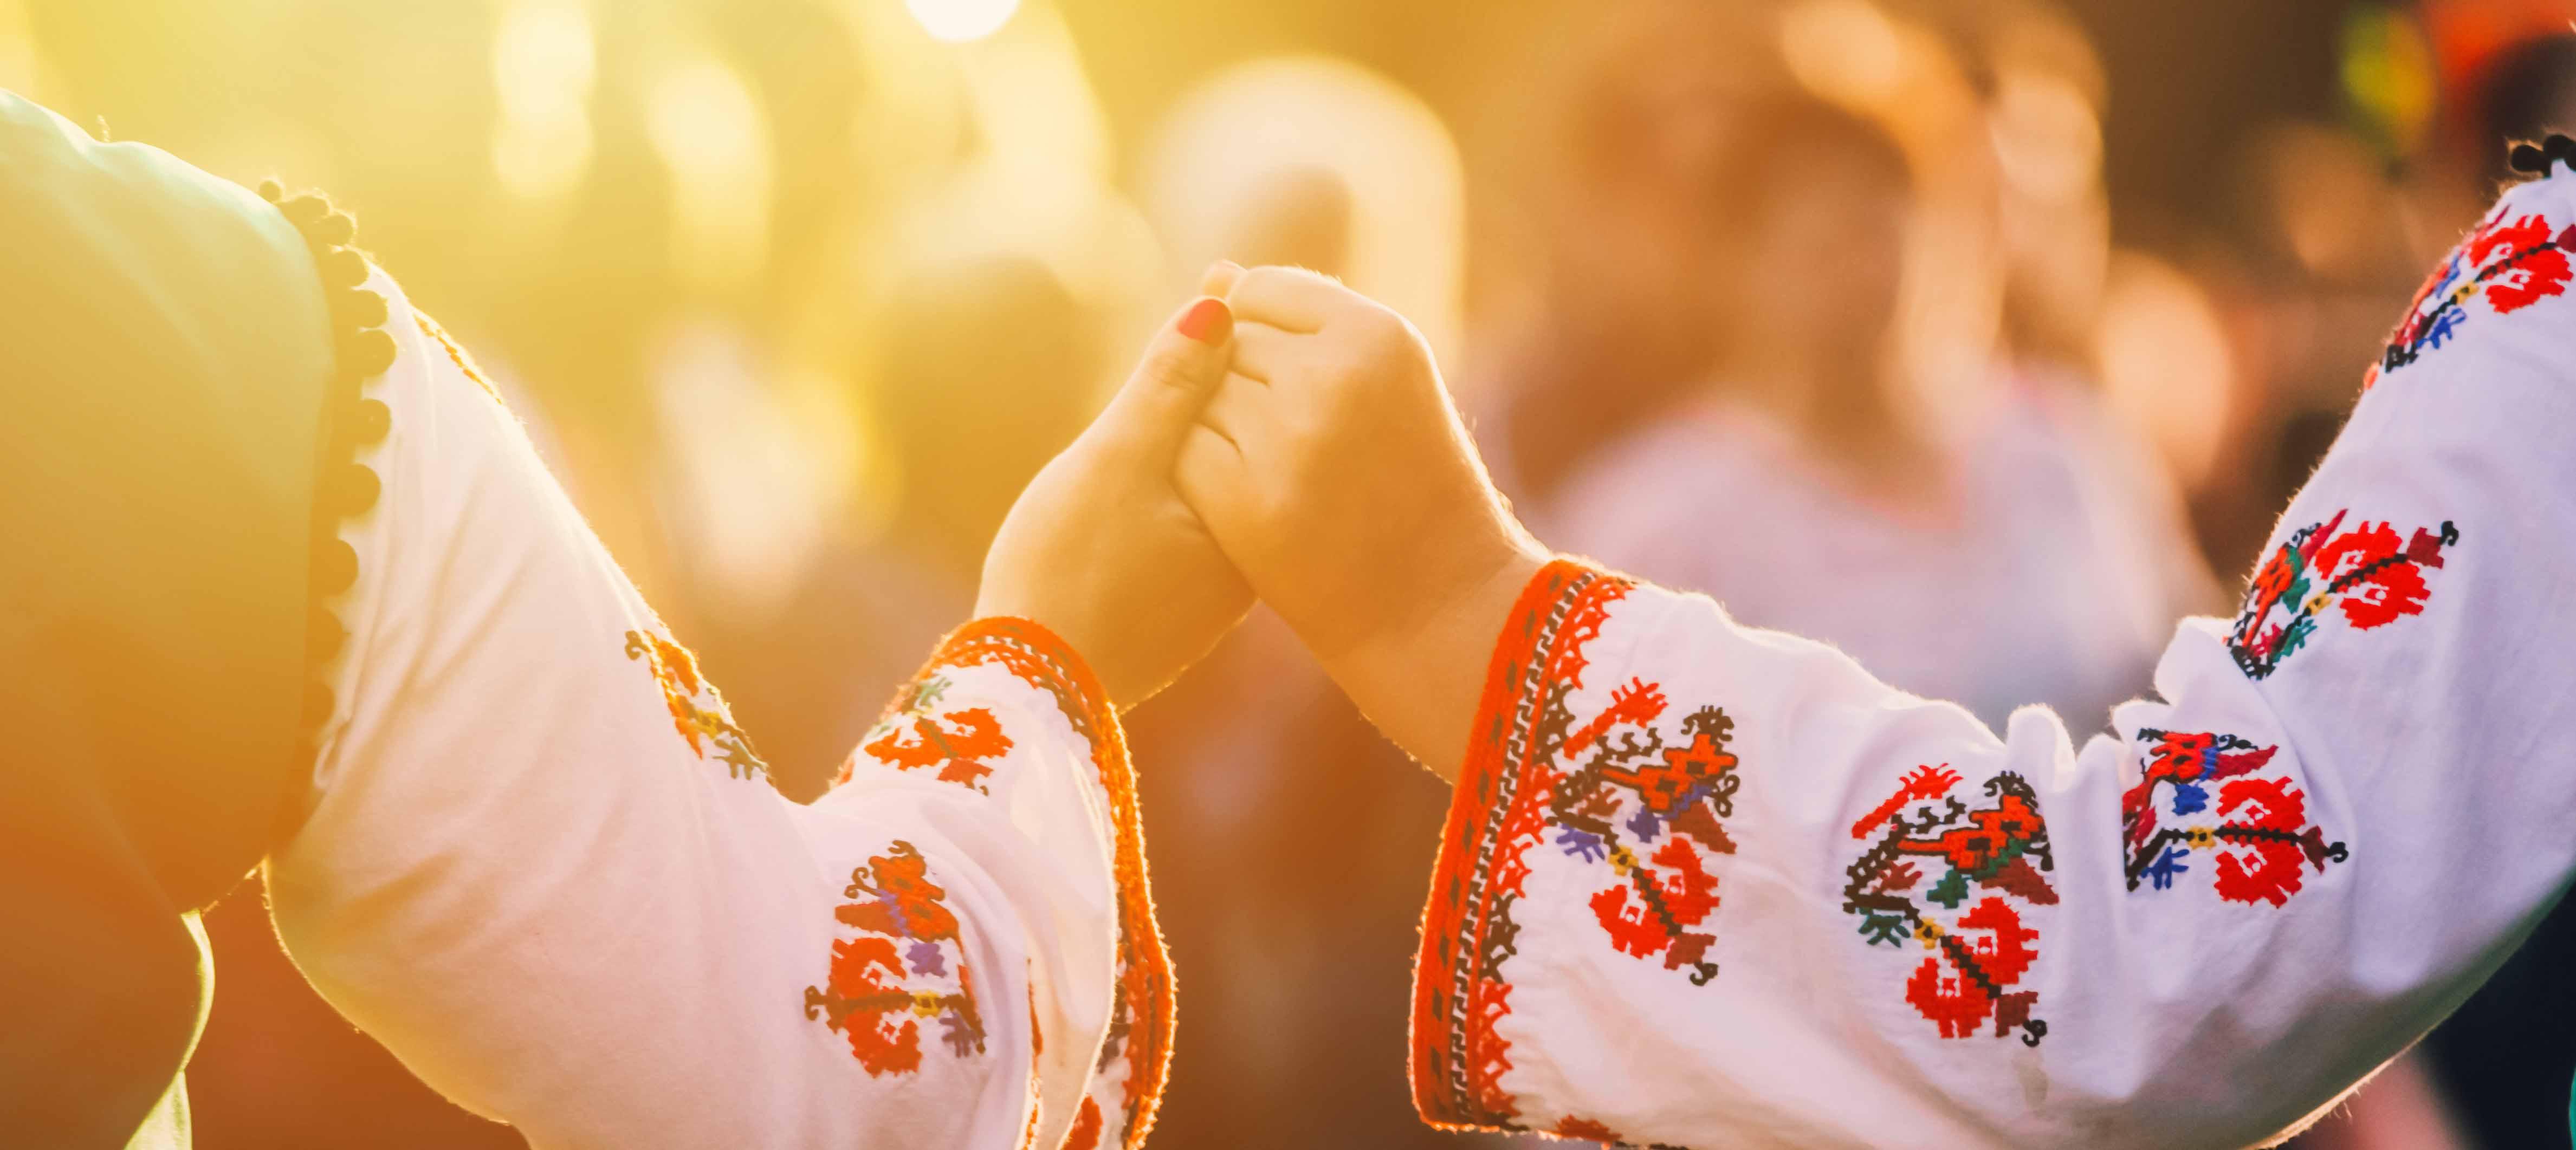 Bulgarske folkedragter